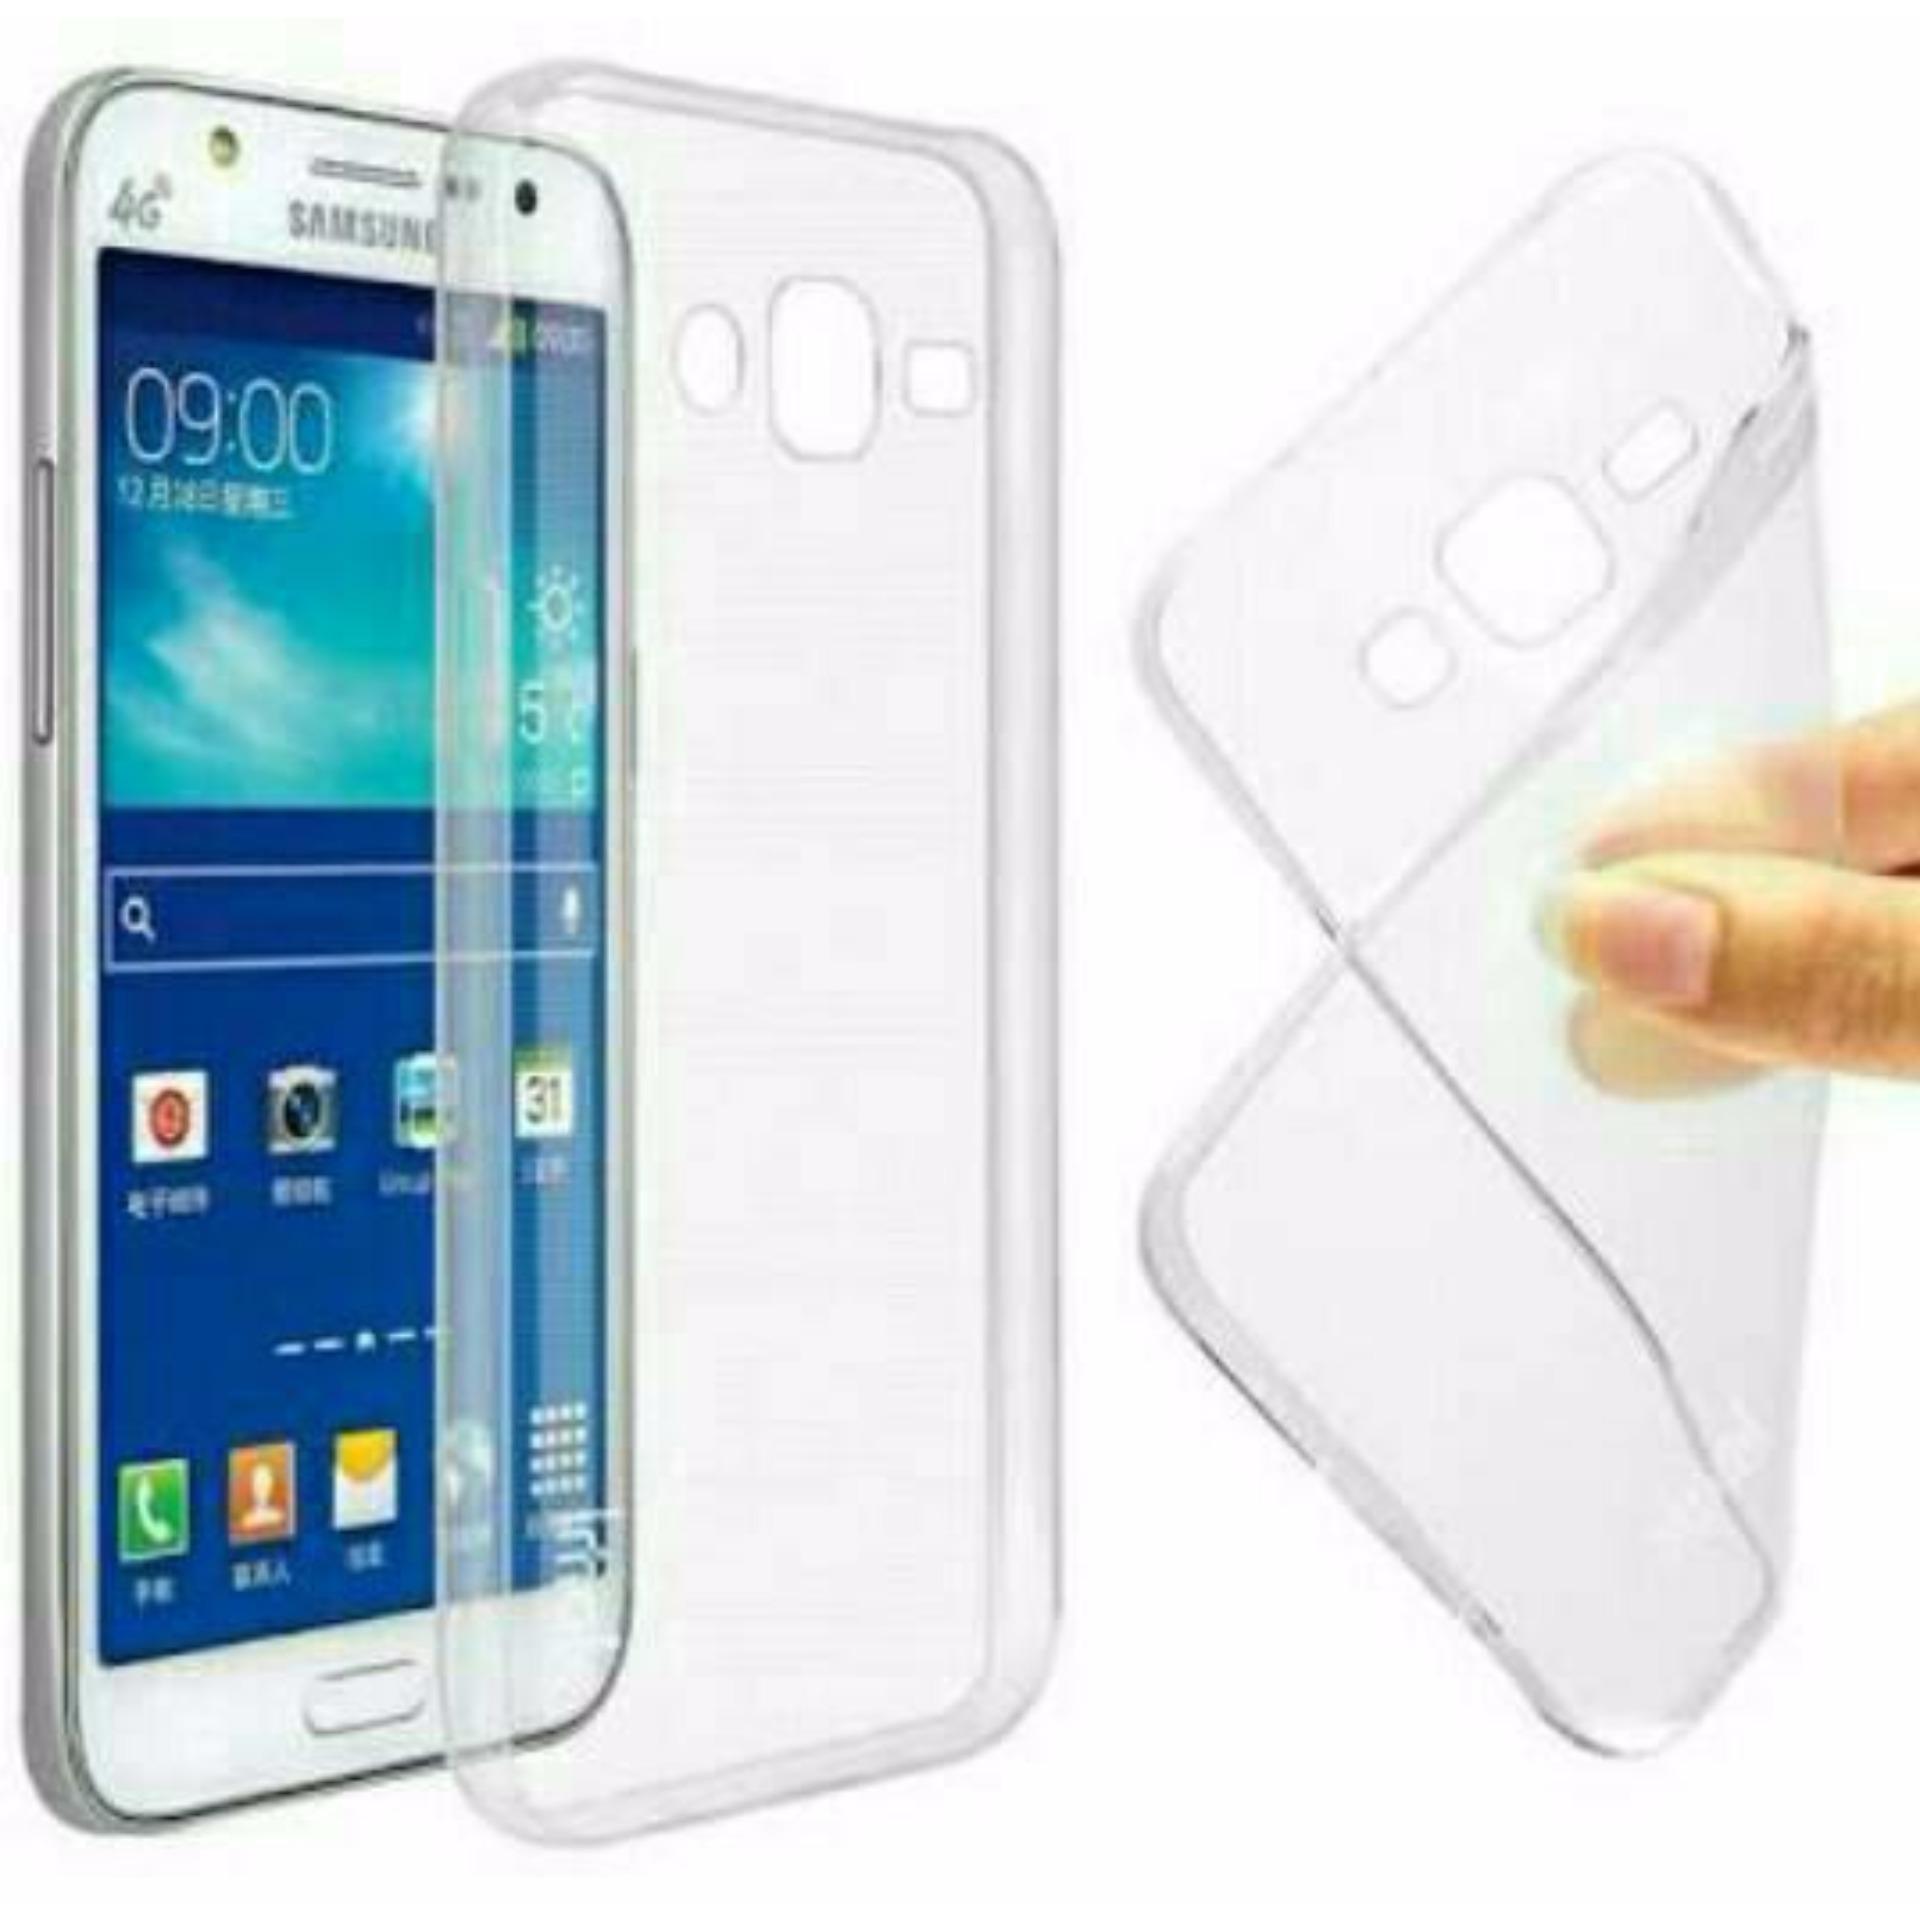 Softcase Jelly Ultrathin For Samsung Galaxy J3 2016 (j3) PutihTransparan - Aircase .